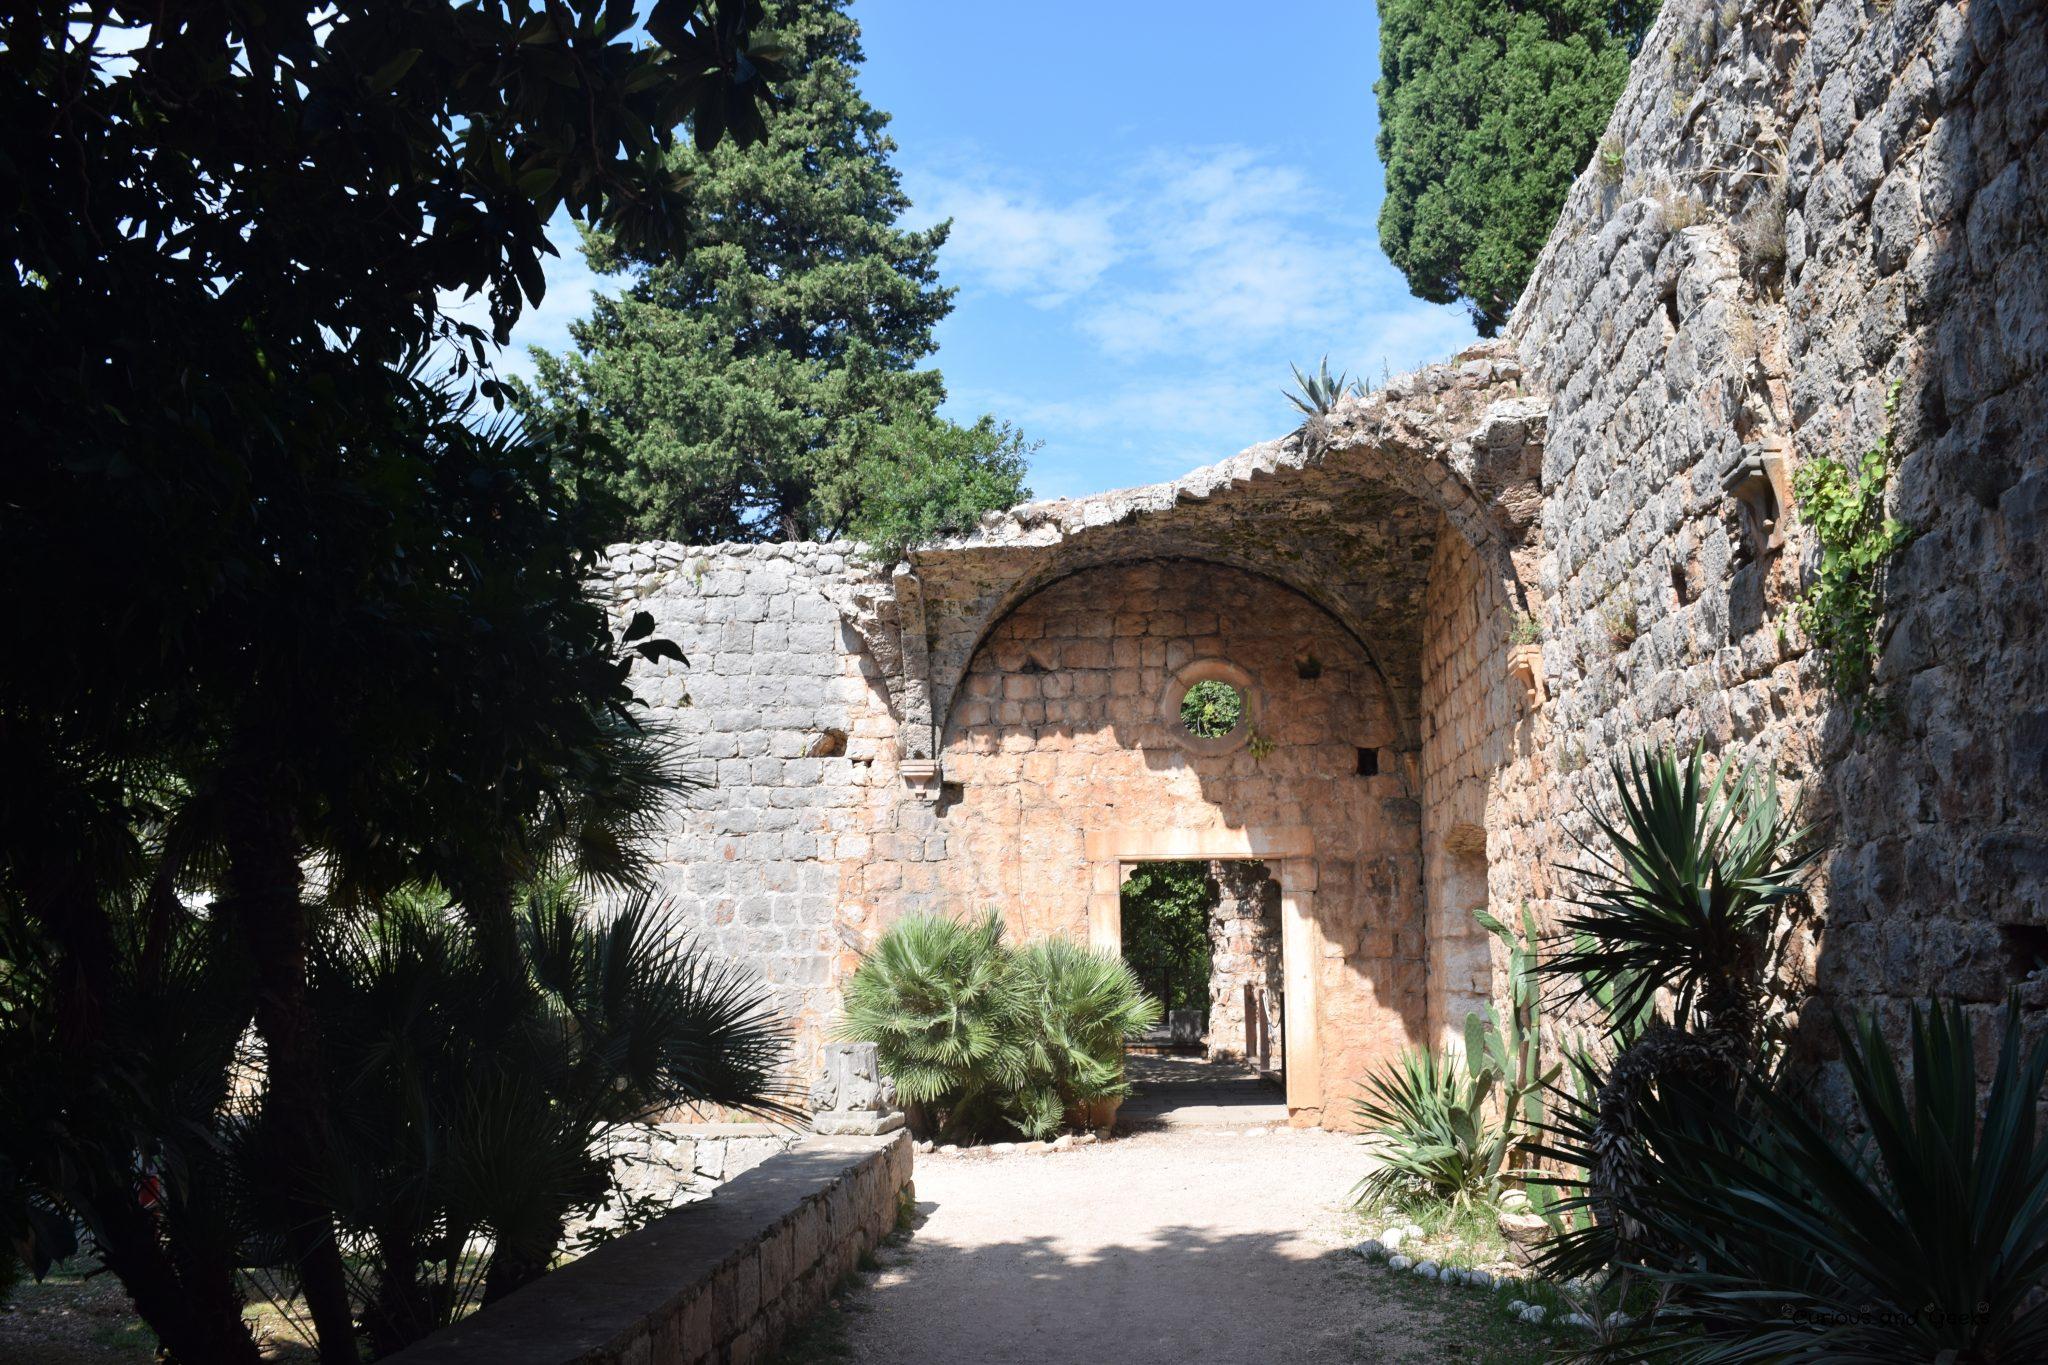 19.Benedictine2 - Game of Thrones filming locations in Dubrovnik